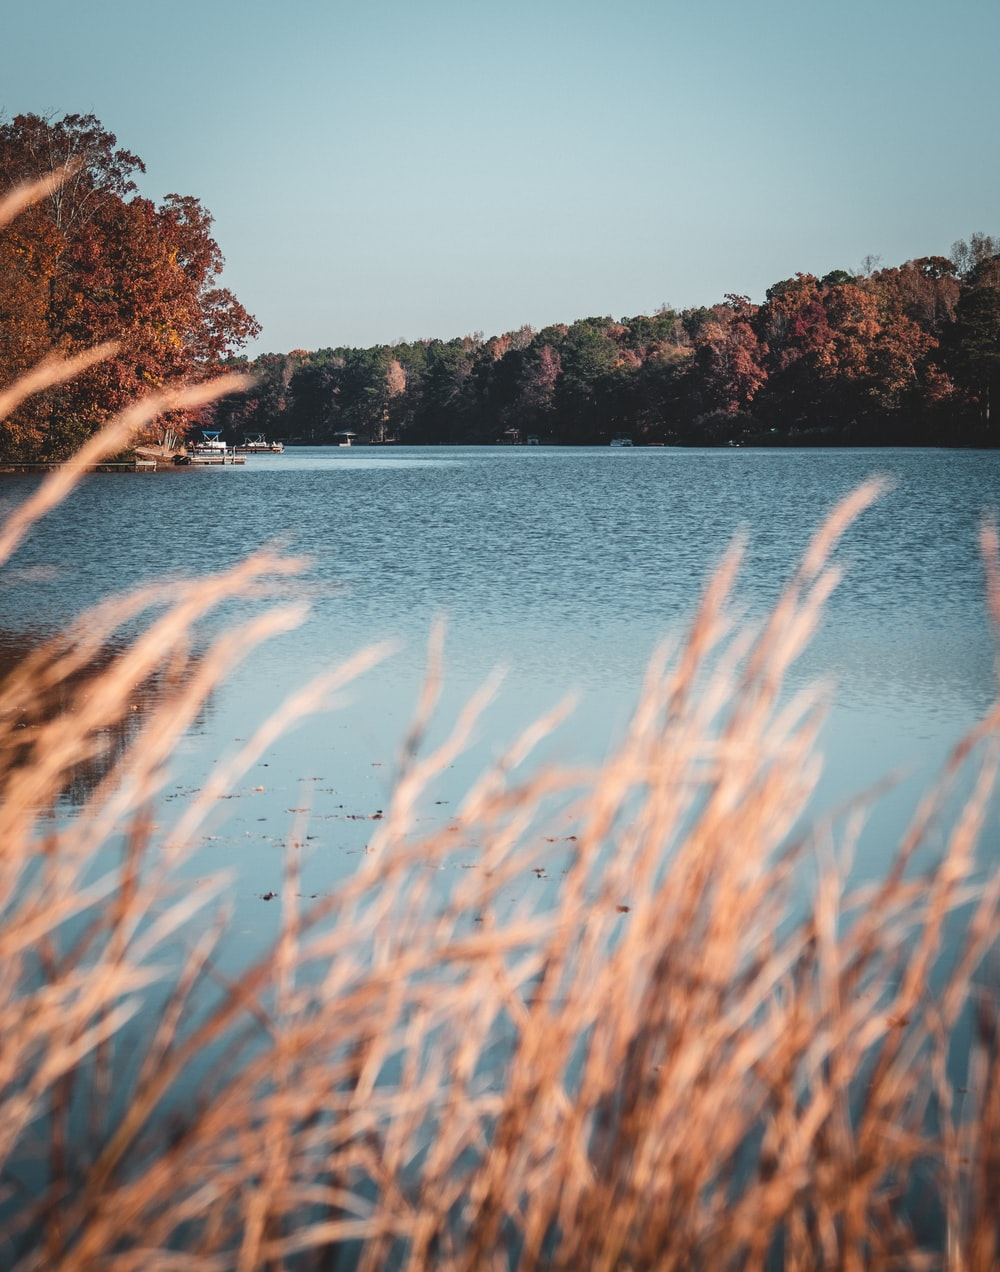 trees beside body of water